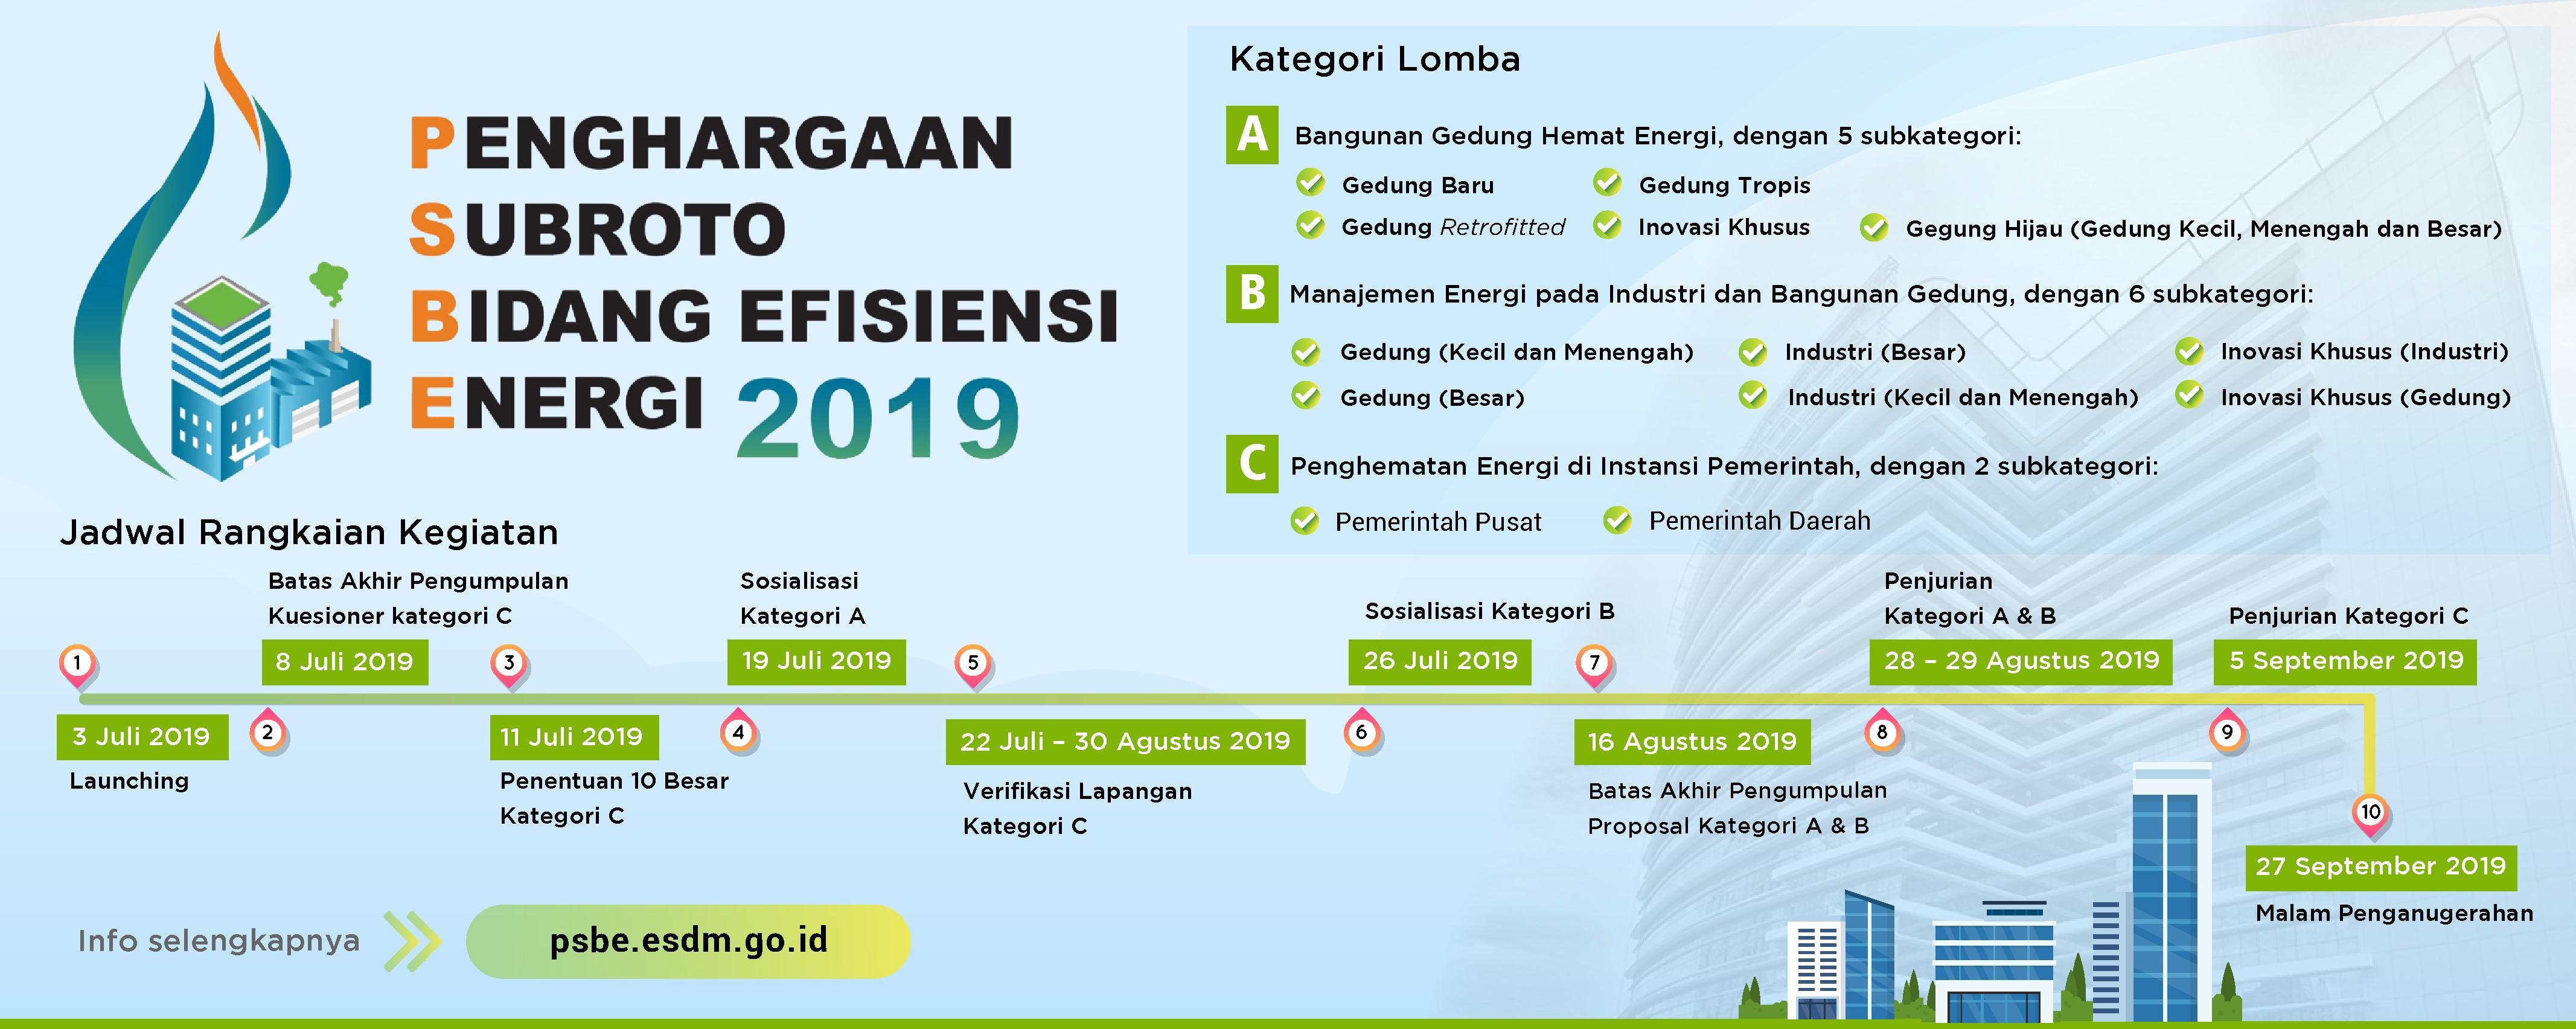 Kementerian ESDM Republik Indonesia